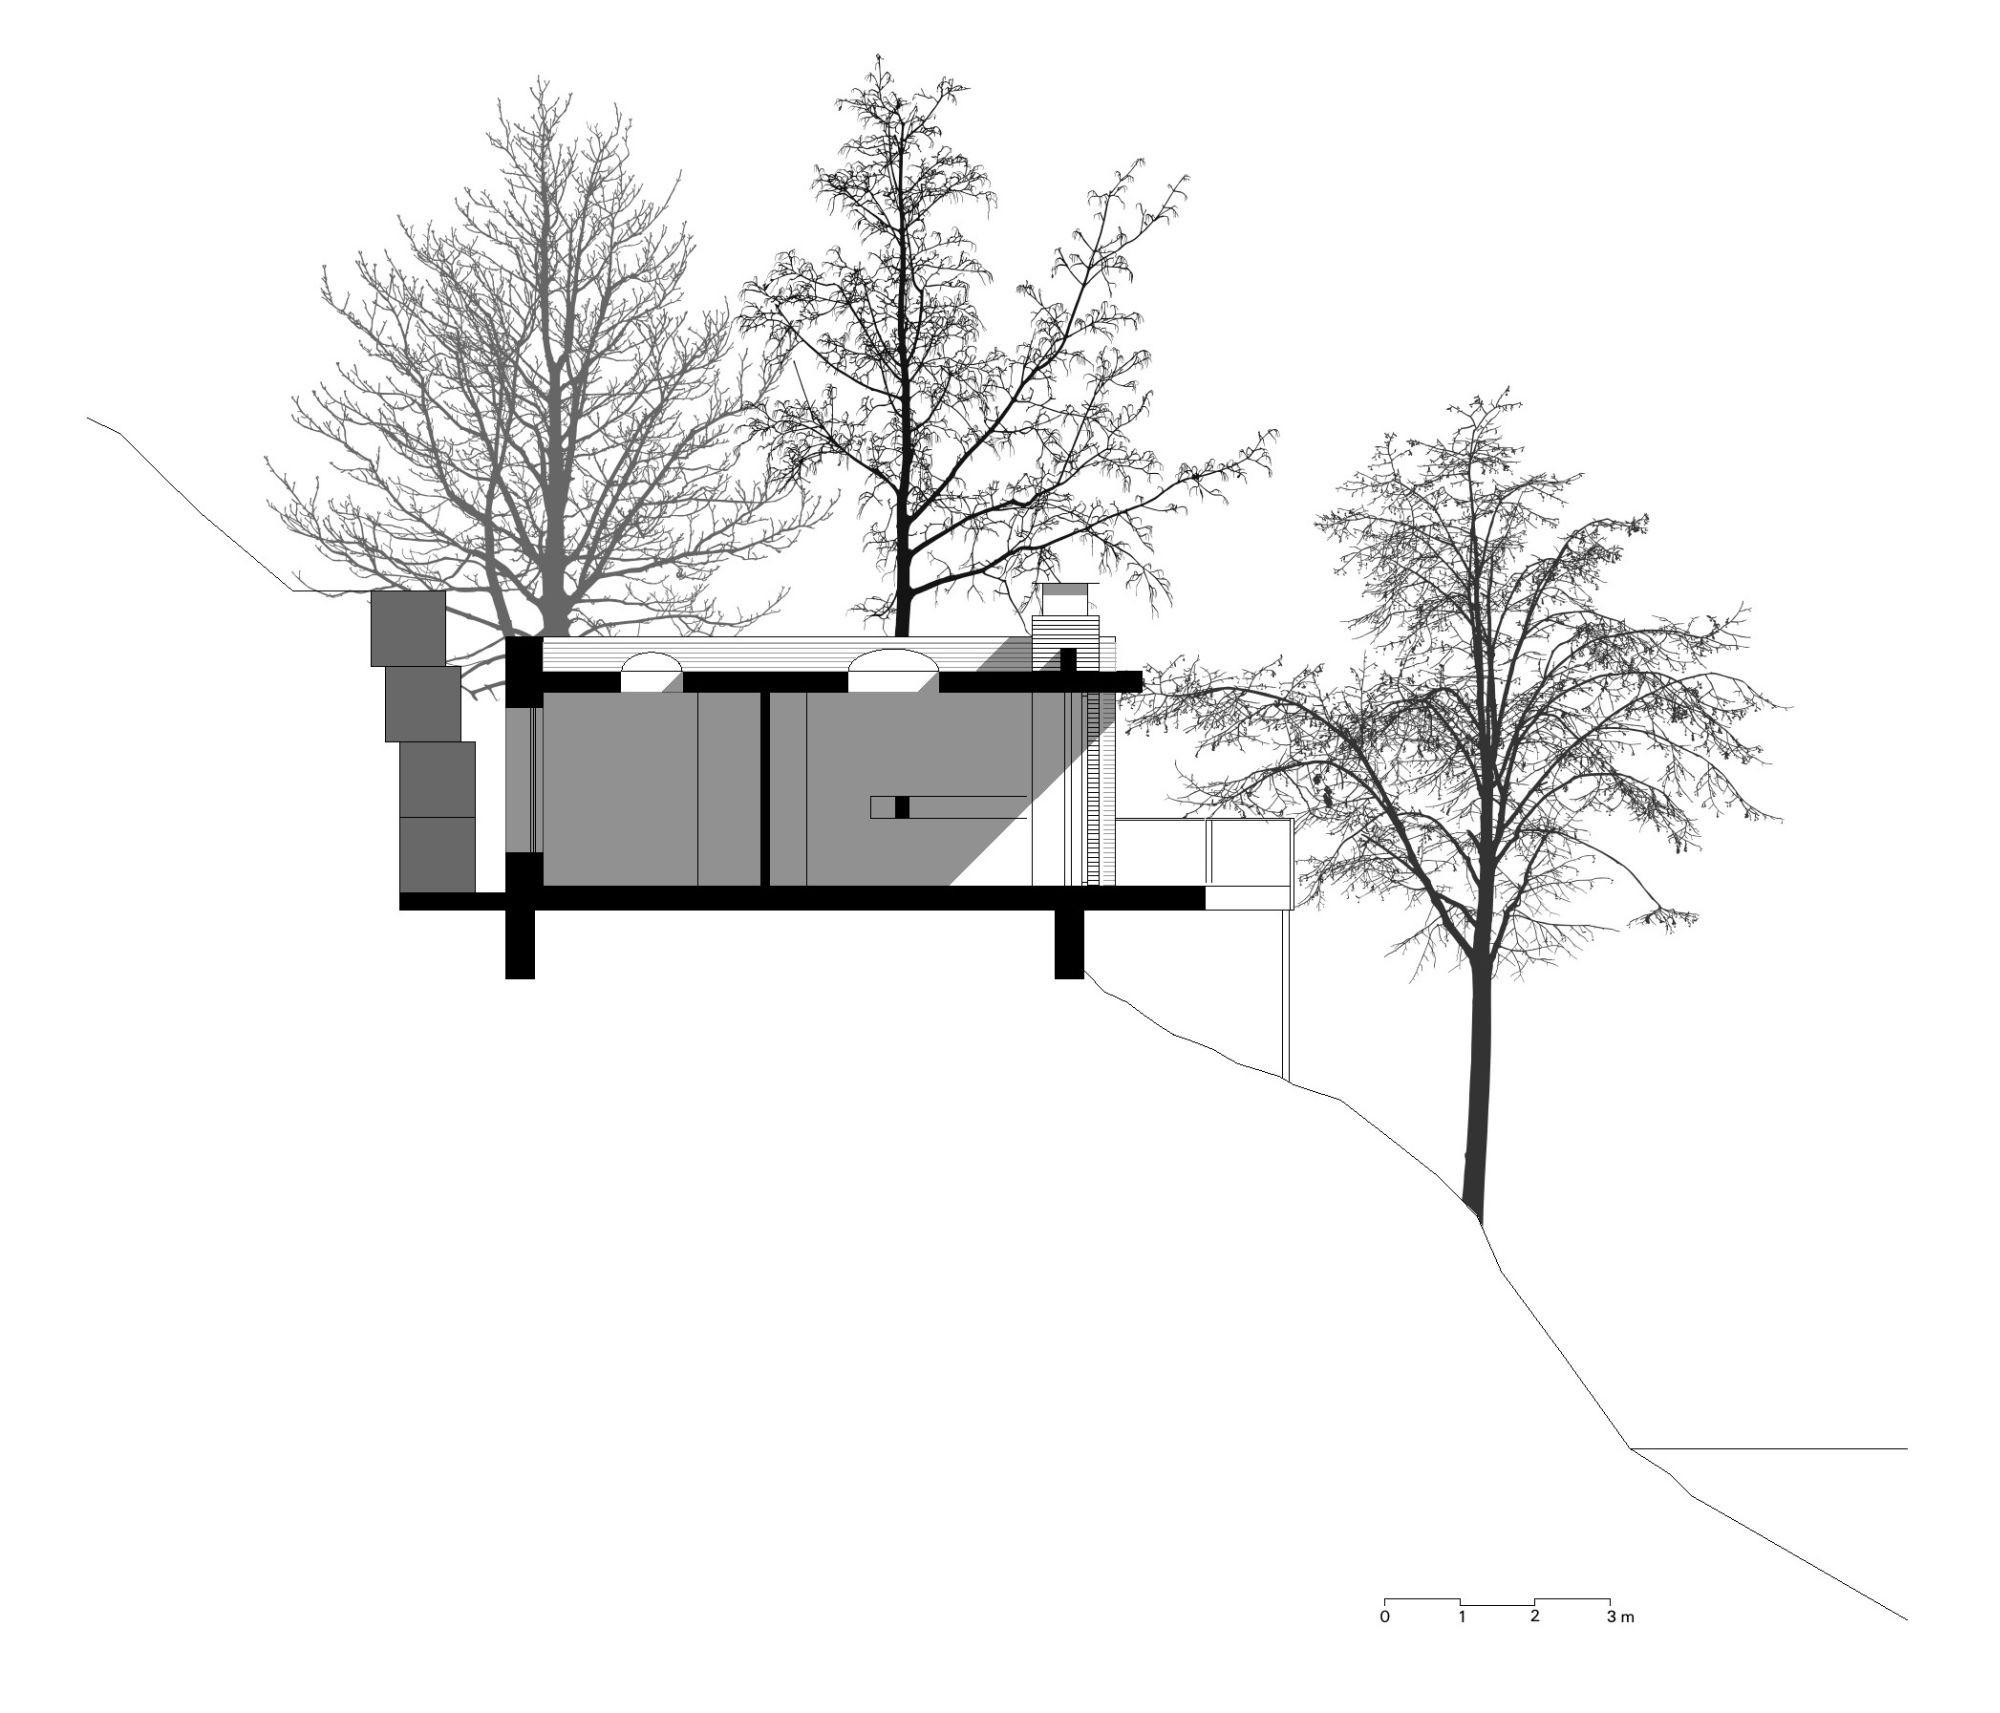 Lhvh Architekten gallery of lake house lhvh architekten 11